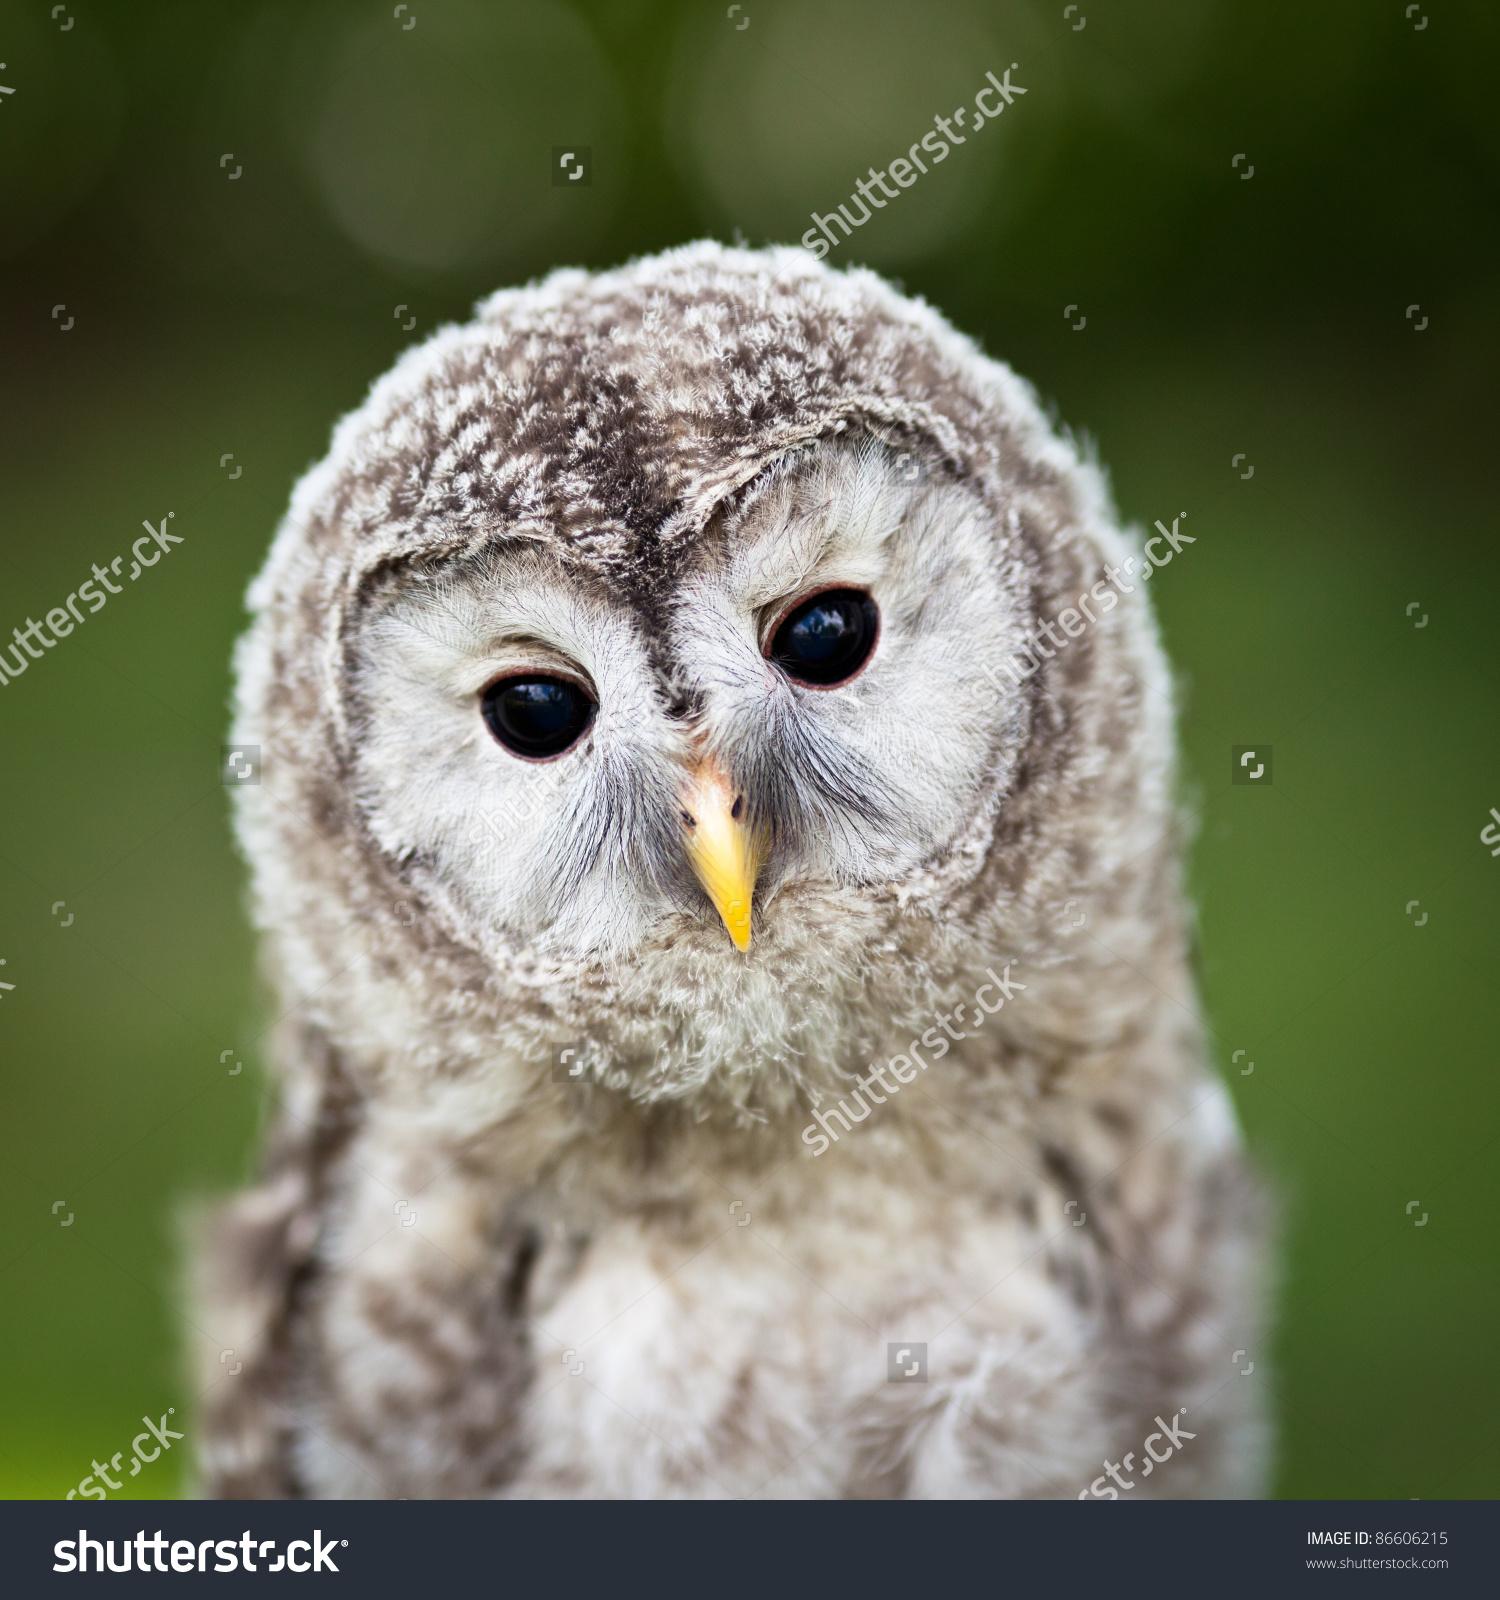 Close Up Of A Baby Tawny Owl (Strix Aluco) Stock Photo 86606215.